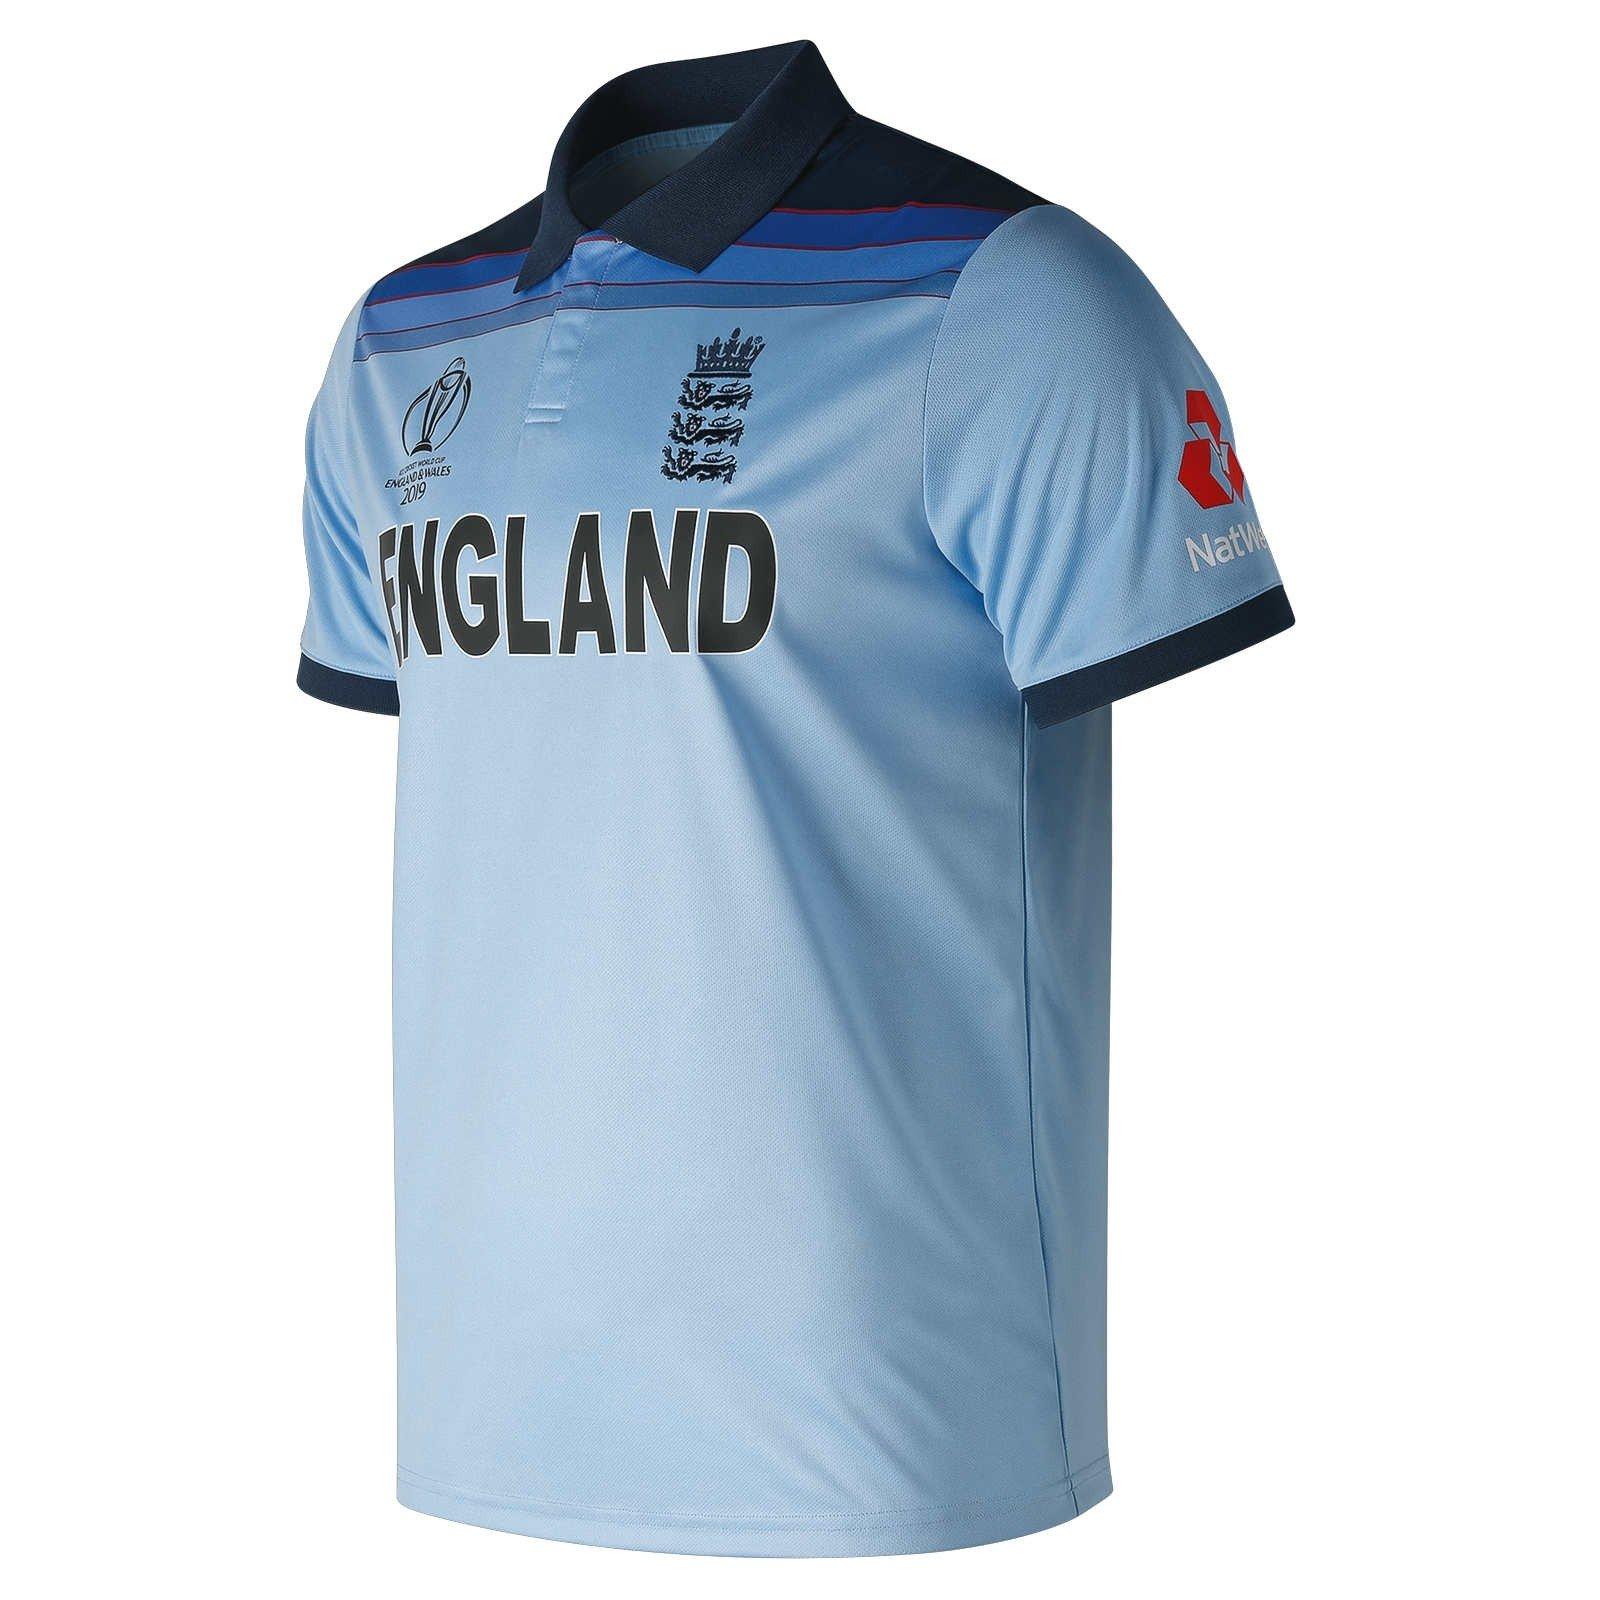 England Cricket World Cup 2019 Batsman T-Shirt Mens